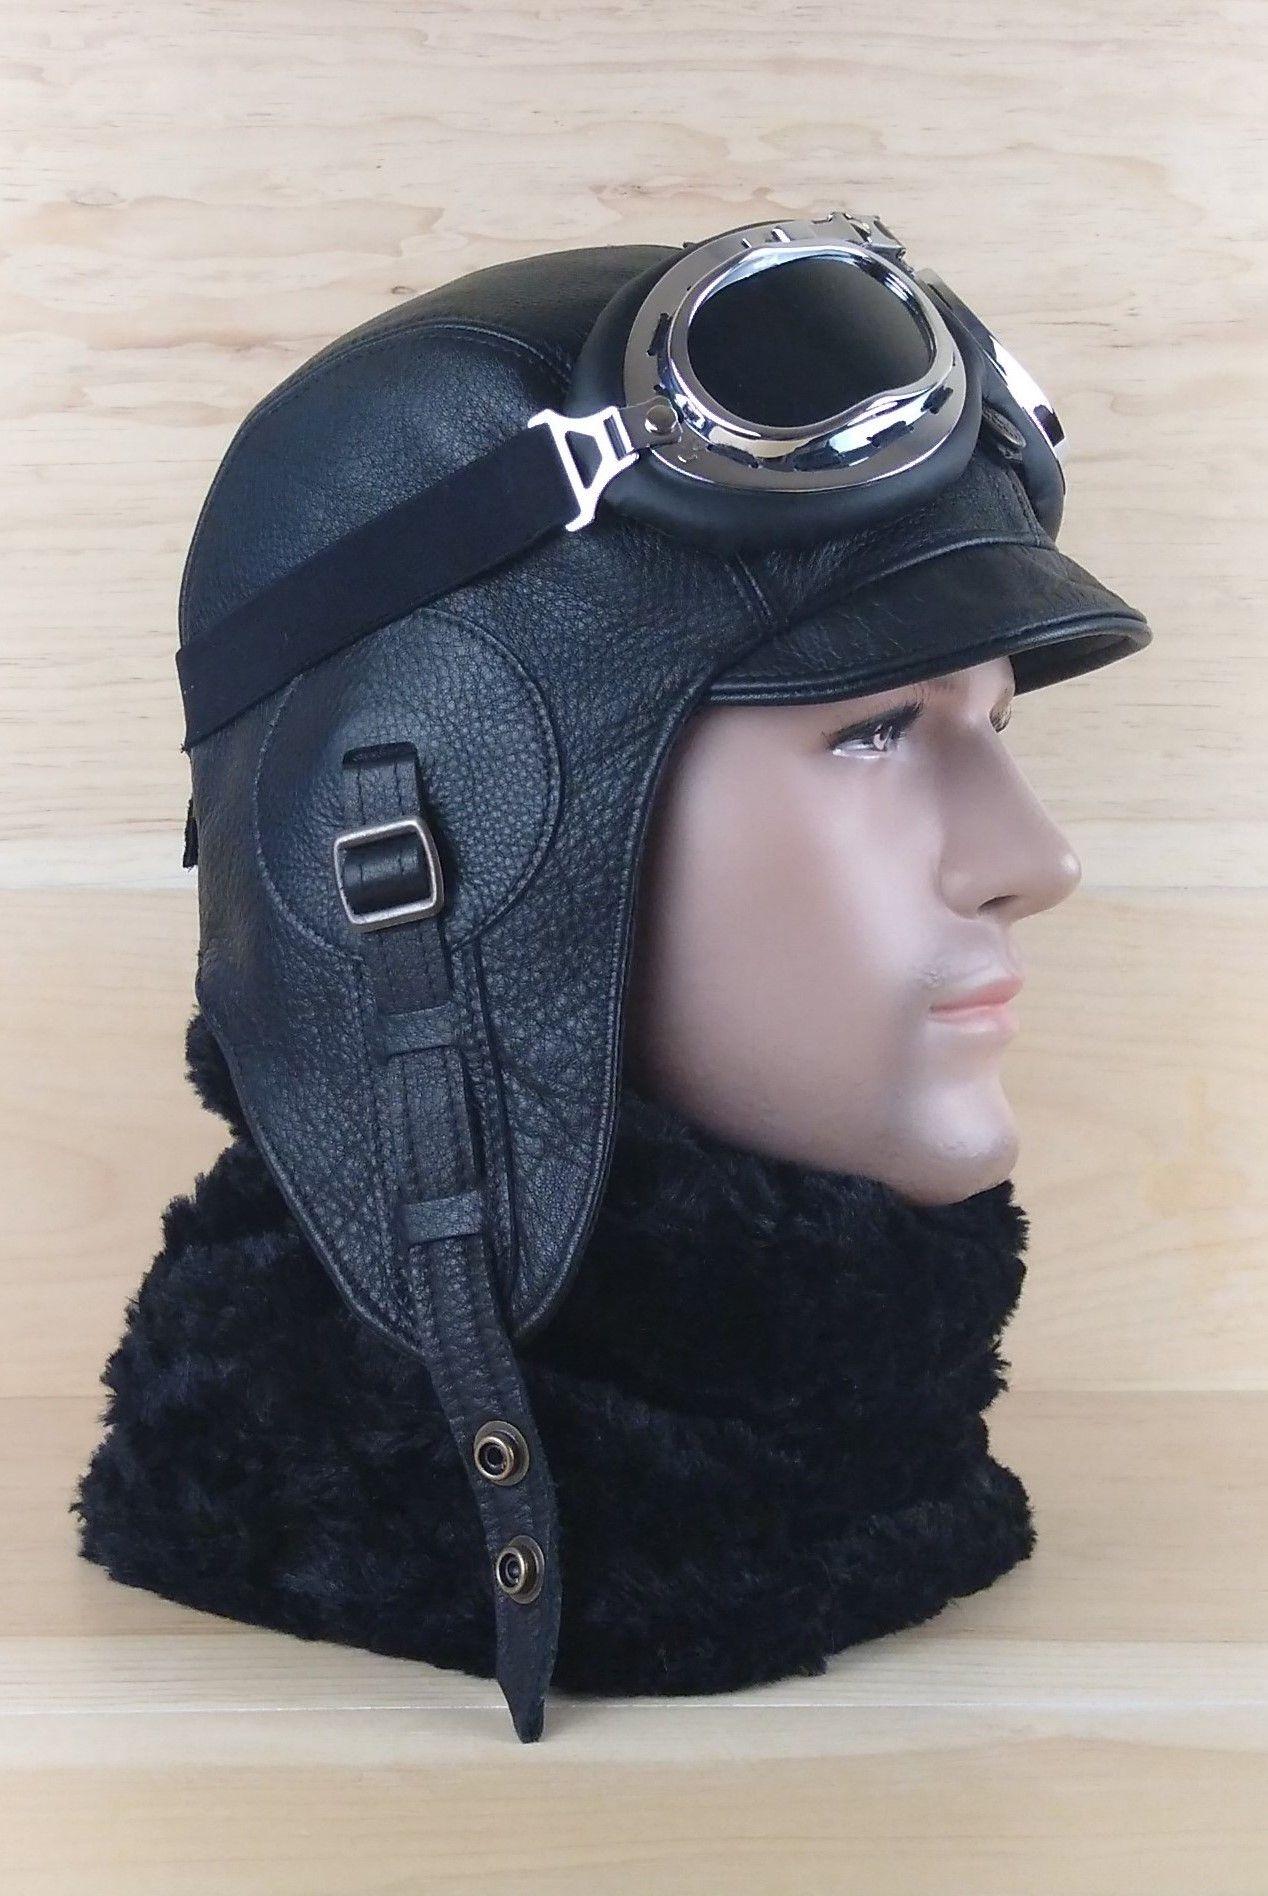 Leather Aviator Hat Motorcycle Helmet Pilot Cap Military Etsy Hats For Men Aviator Hat Leather Motorcycle Helmet